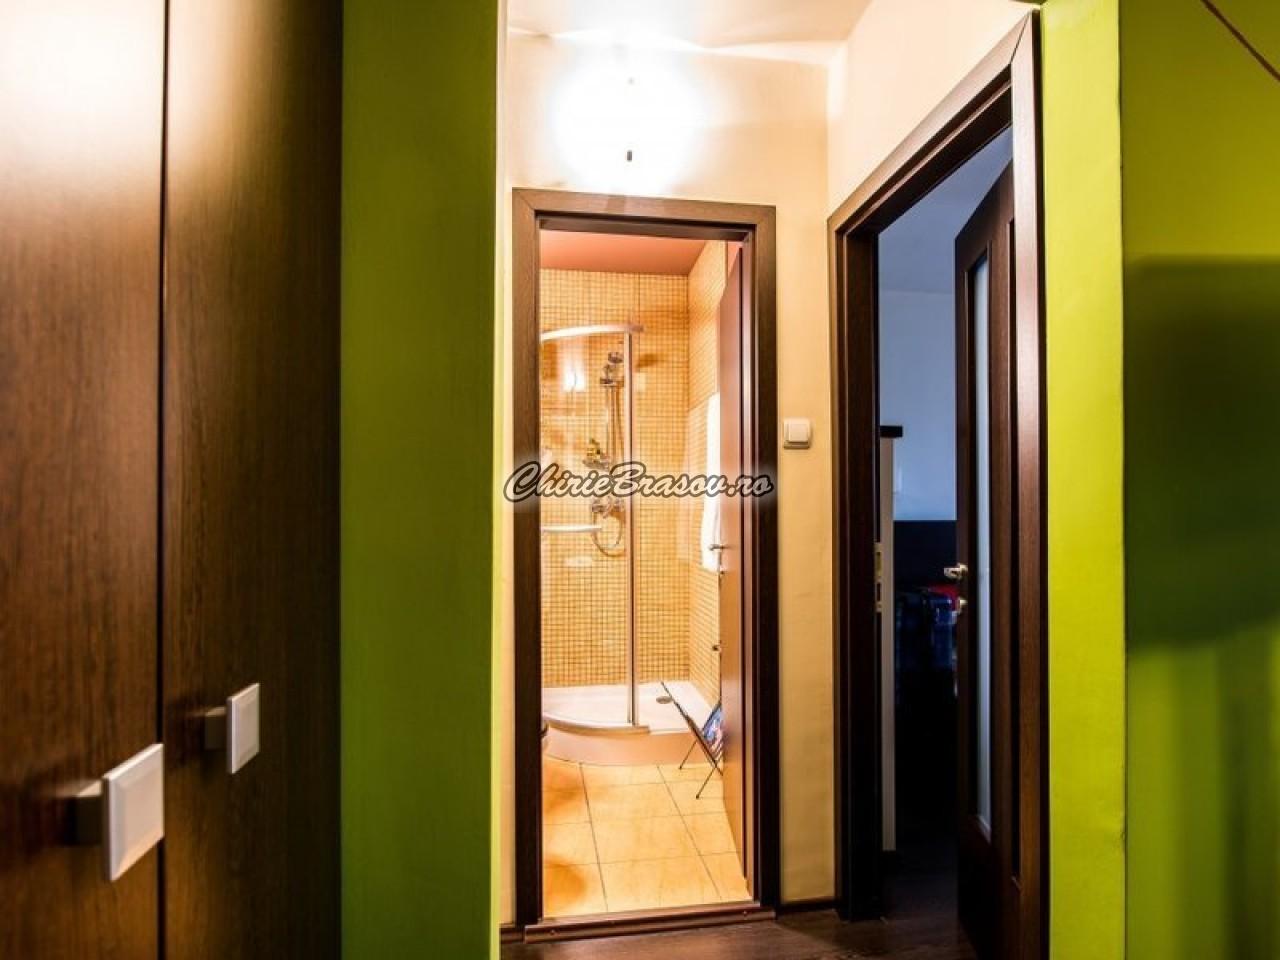 Inchiriere apartament 2 camere Brasov , Central - Grivitei-353-2